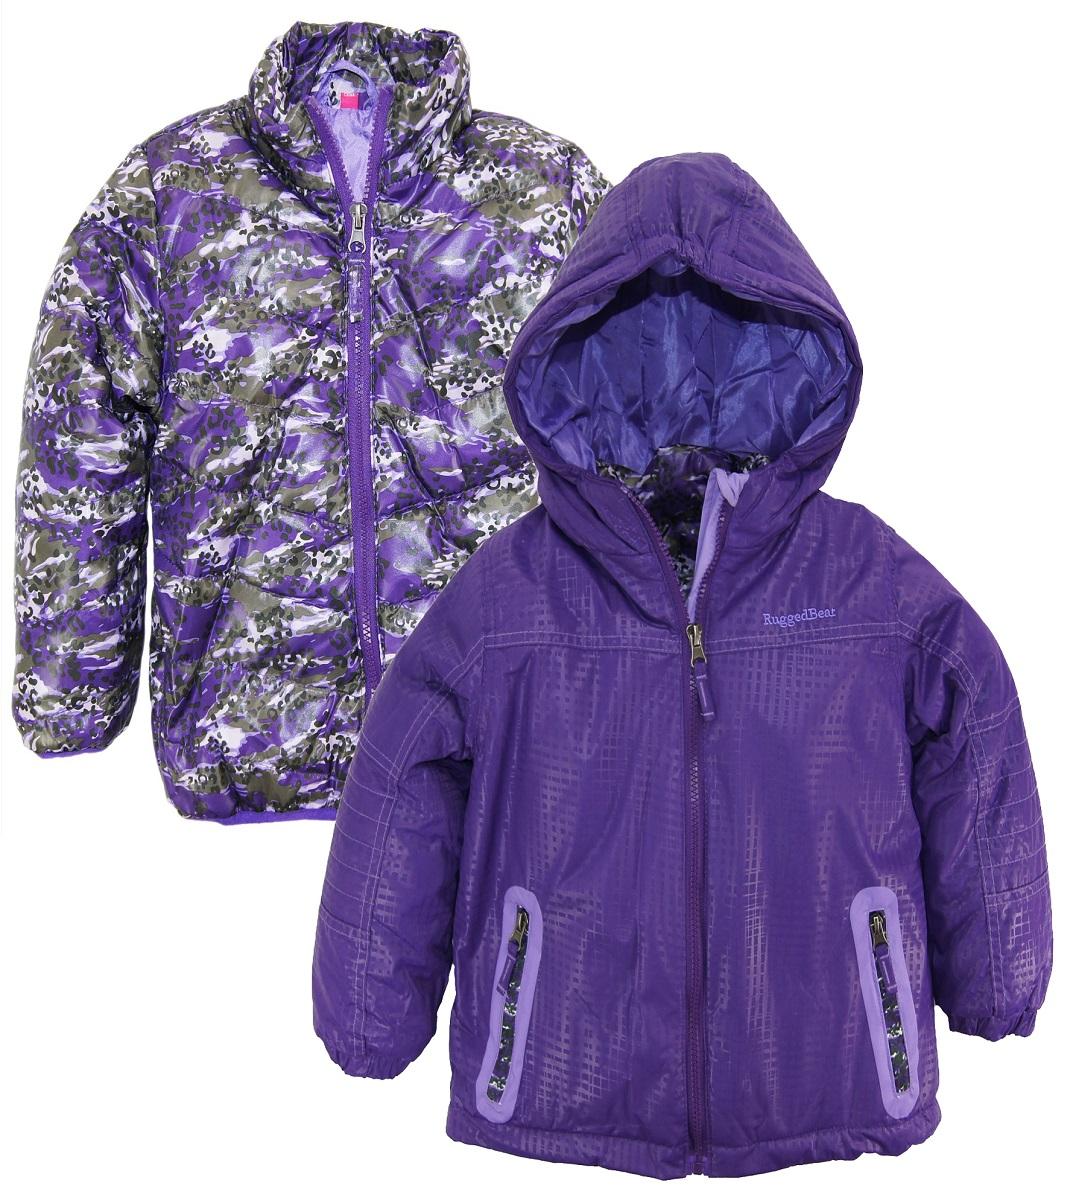 bd813662cdea Rugged Bear Girls 2-in-1 System Winter Coat Hooded Camo Cheetah ...